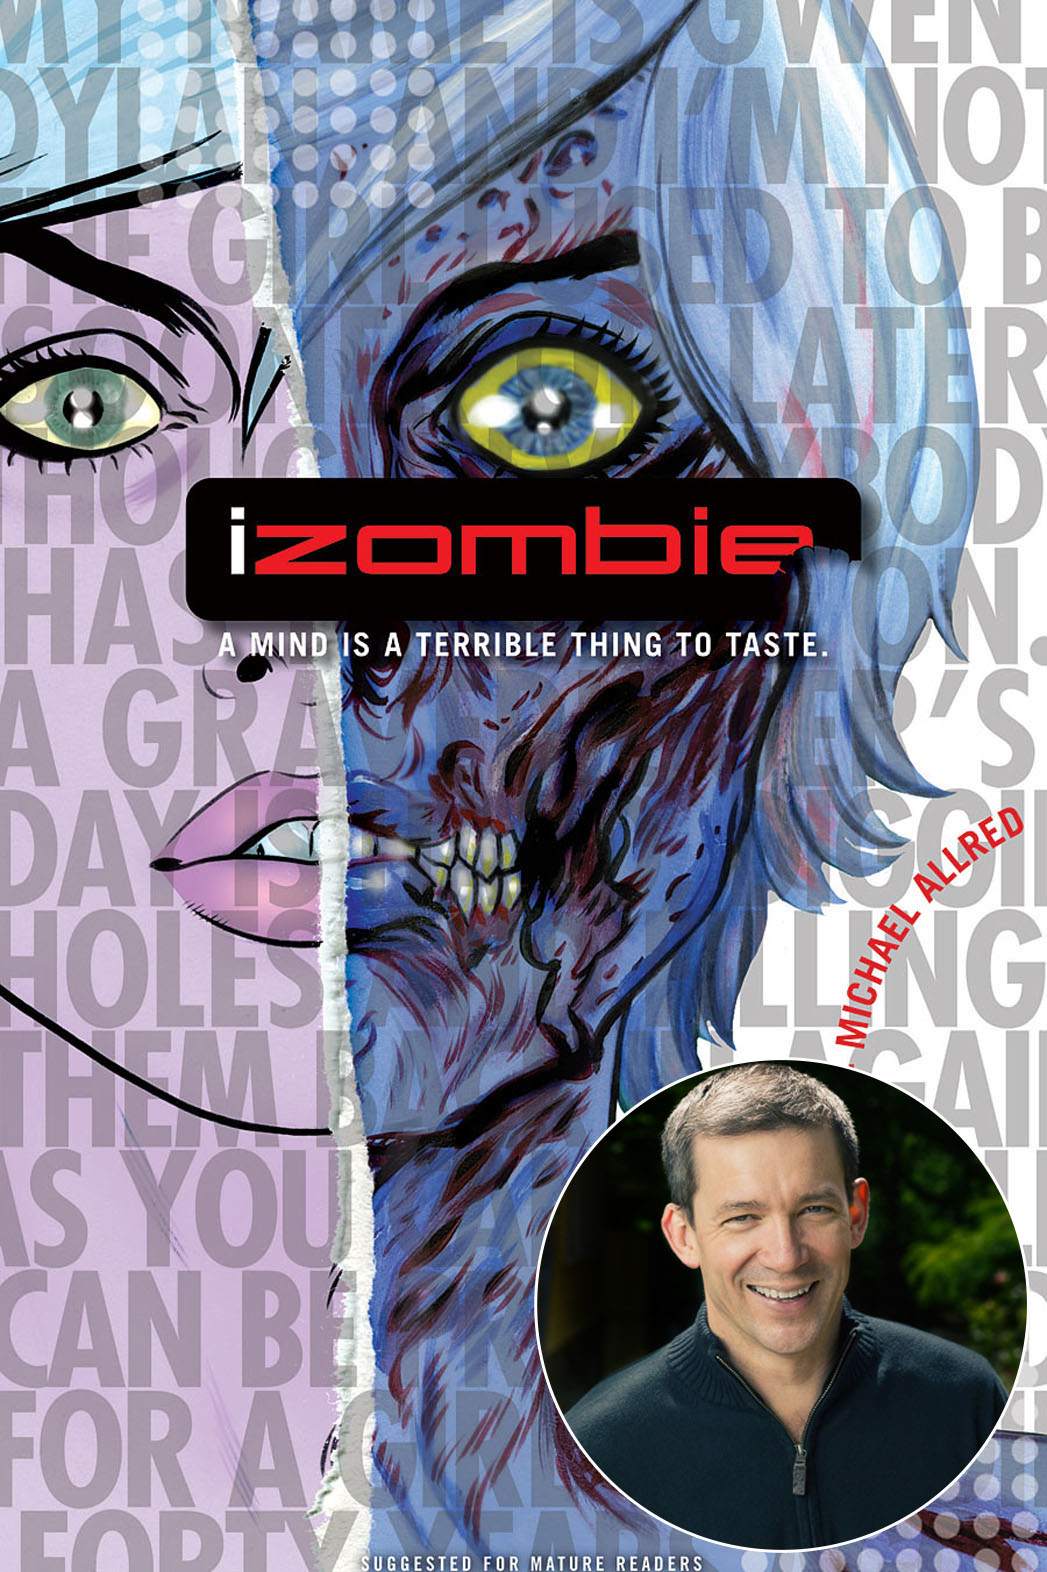 iZombie Cover Rob Thomas Inset - P 2014